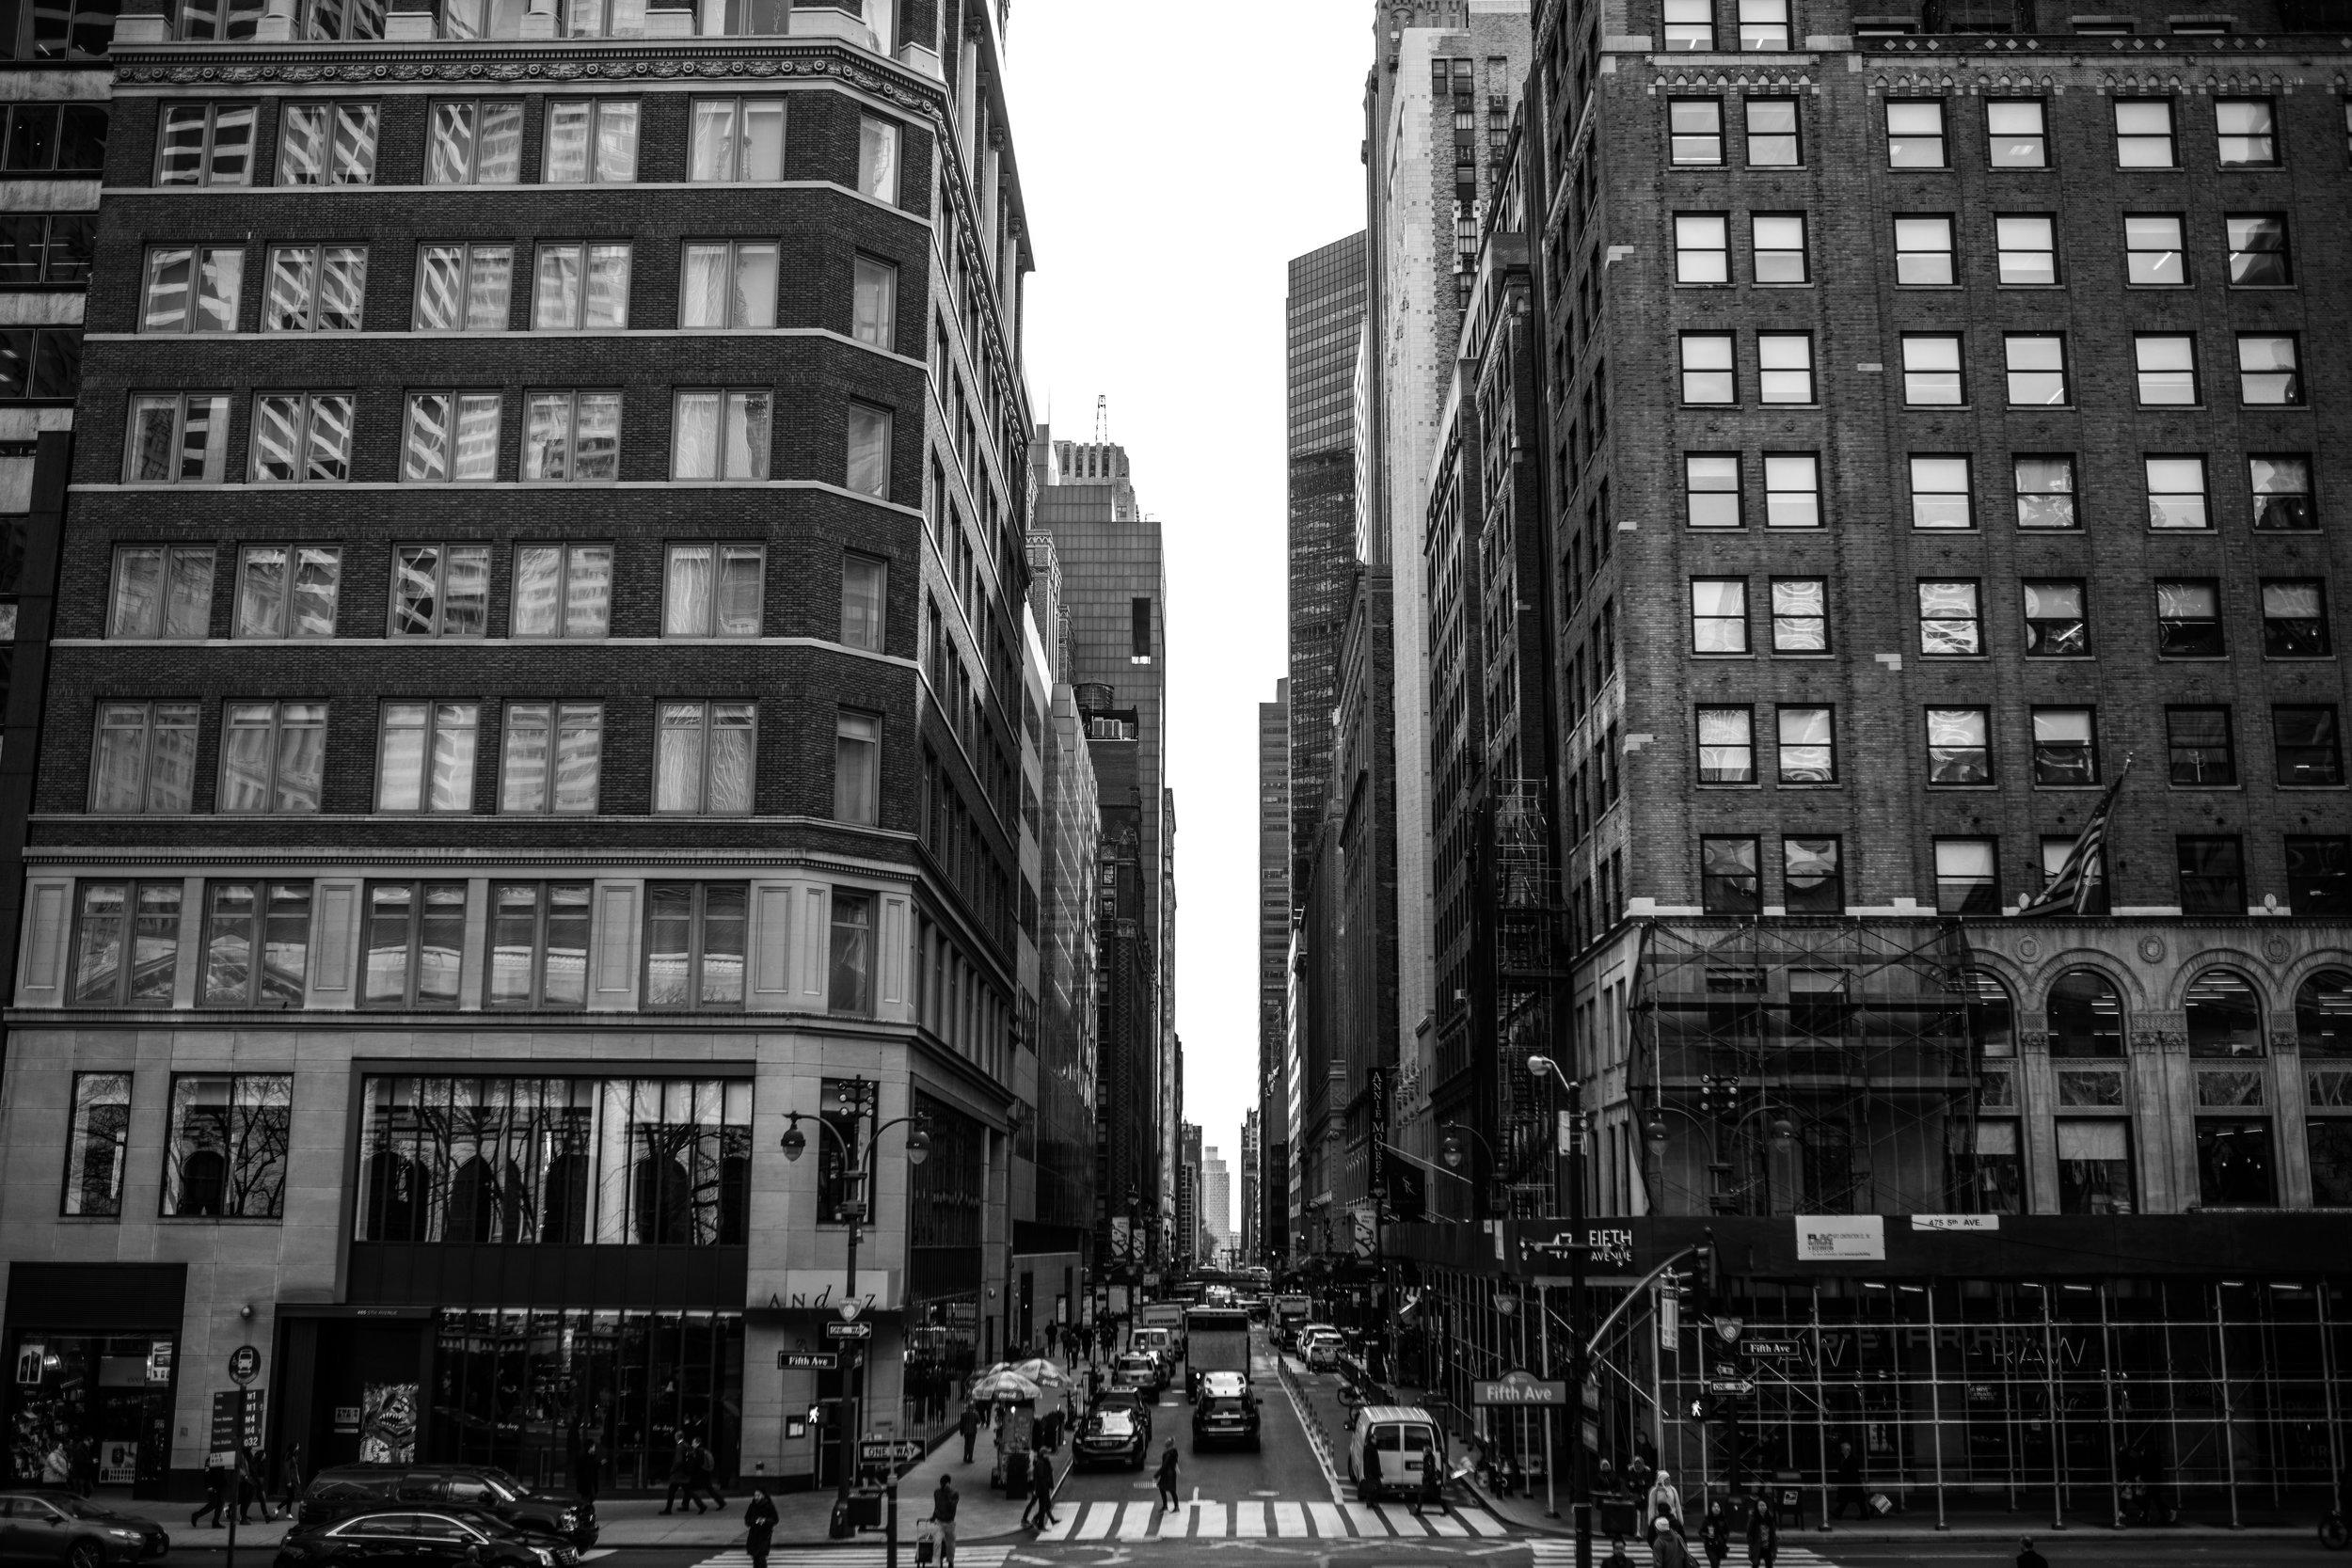 NYC_0062.jpg